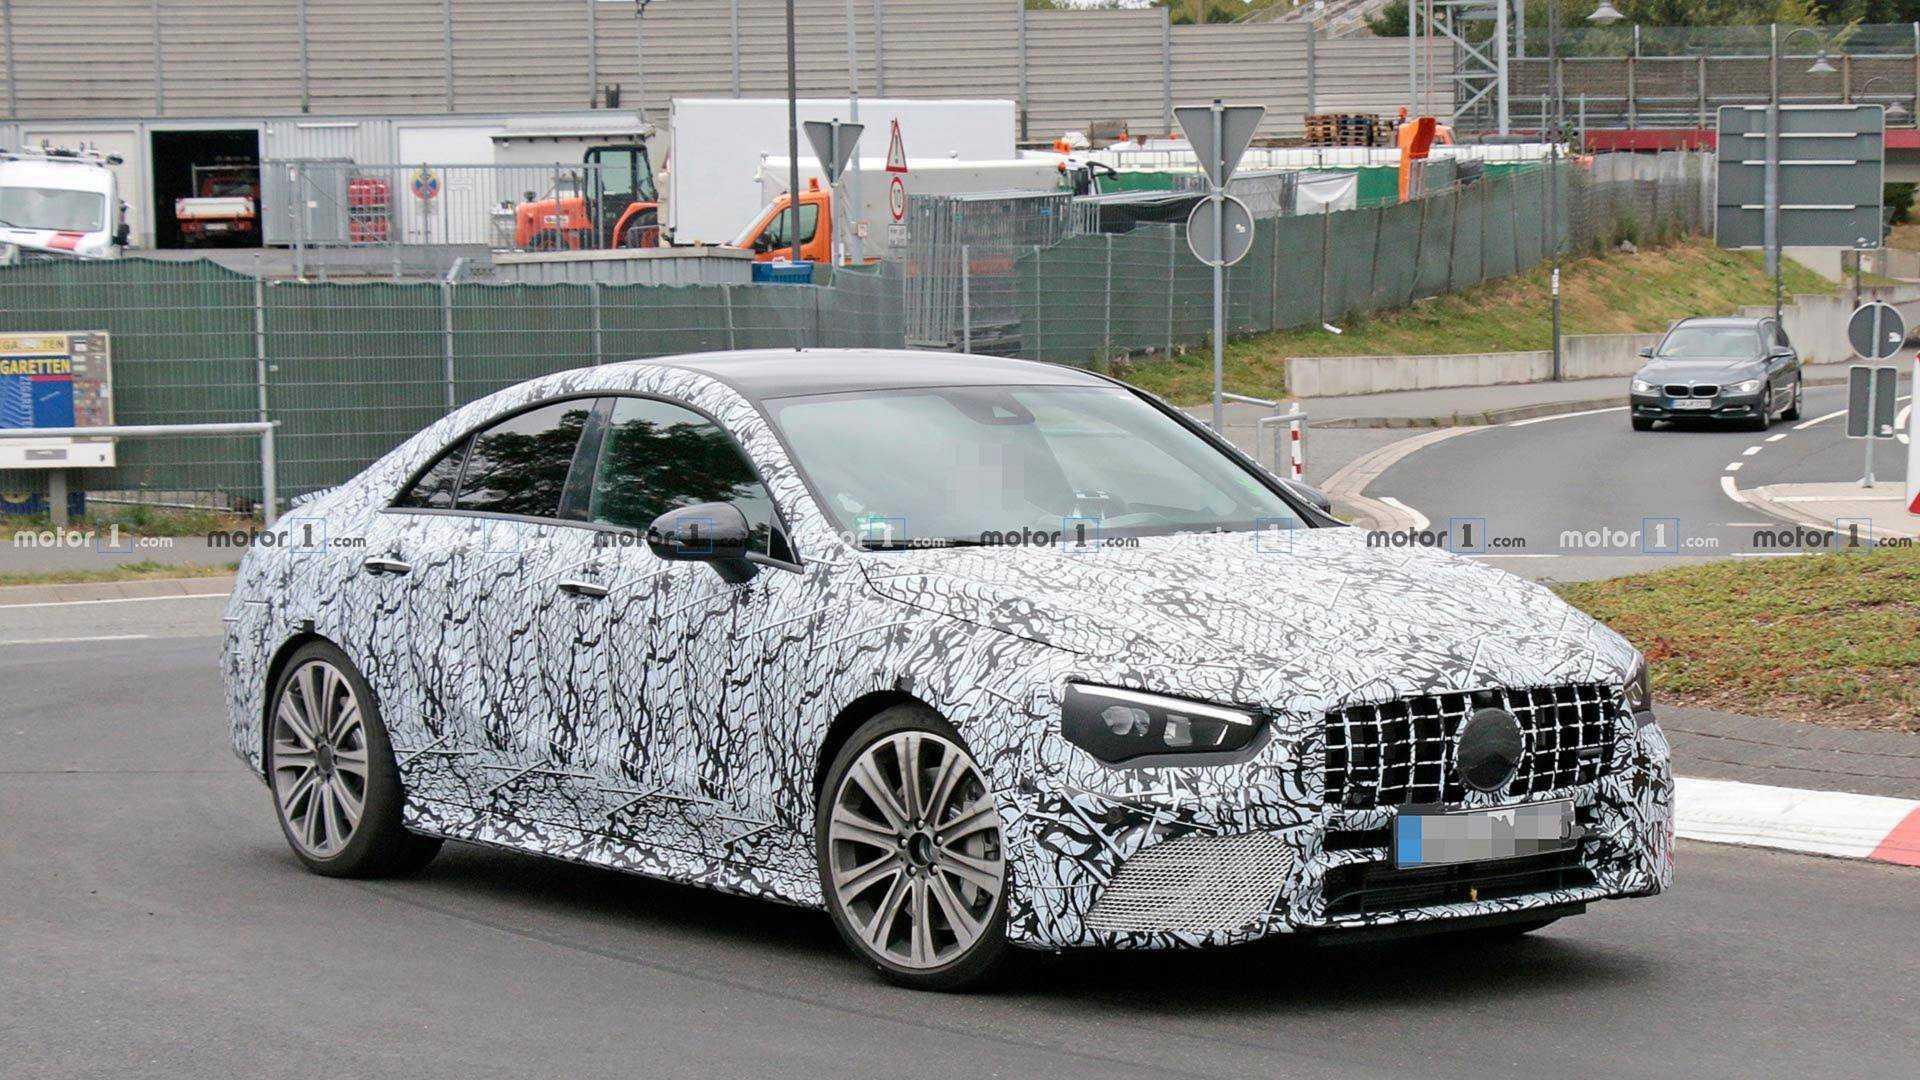 2019 - [Mercedes-Benz] CLA II - Page 2 Mercedes-amg-cla45-spy-shots